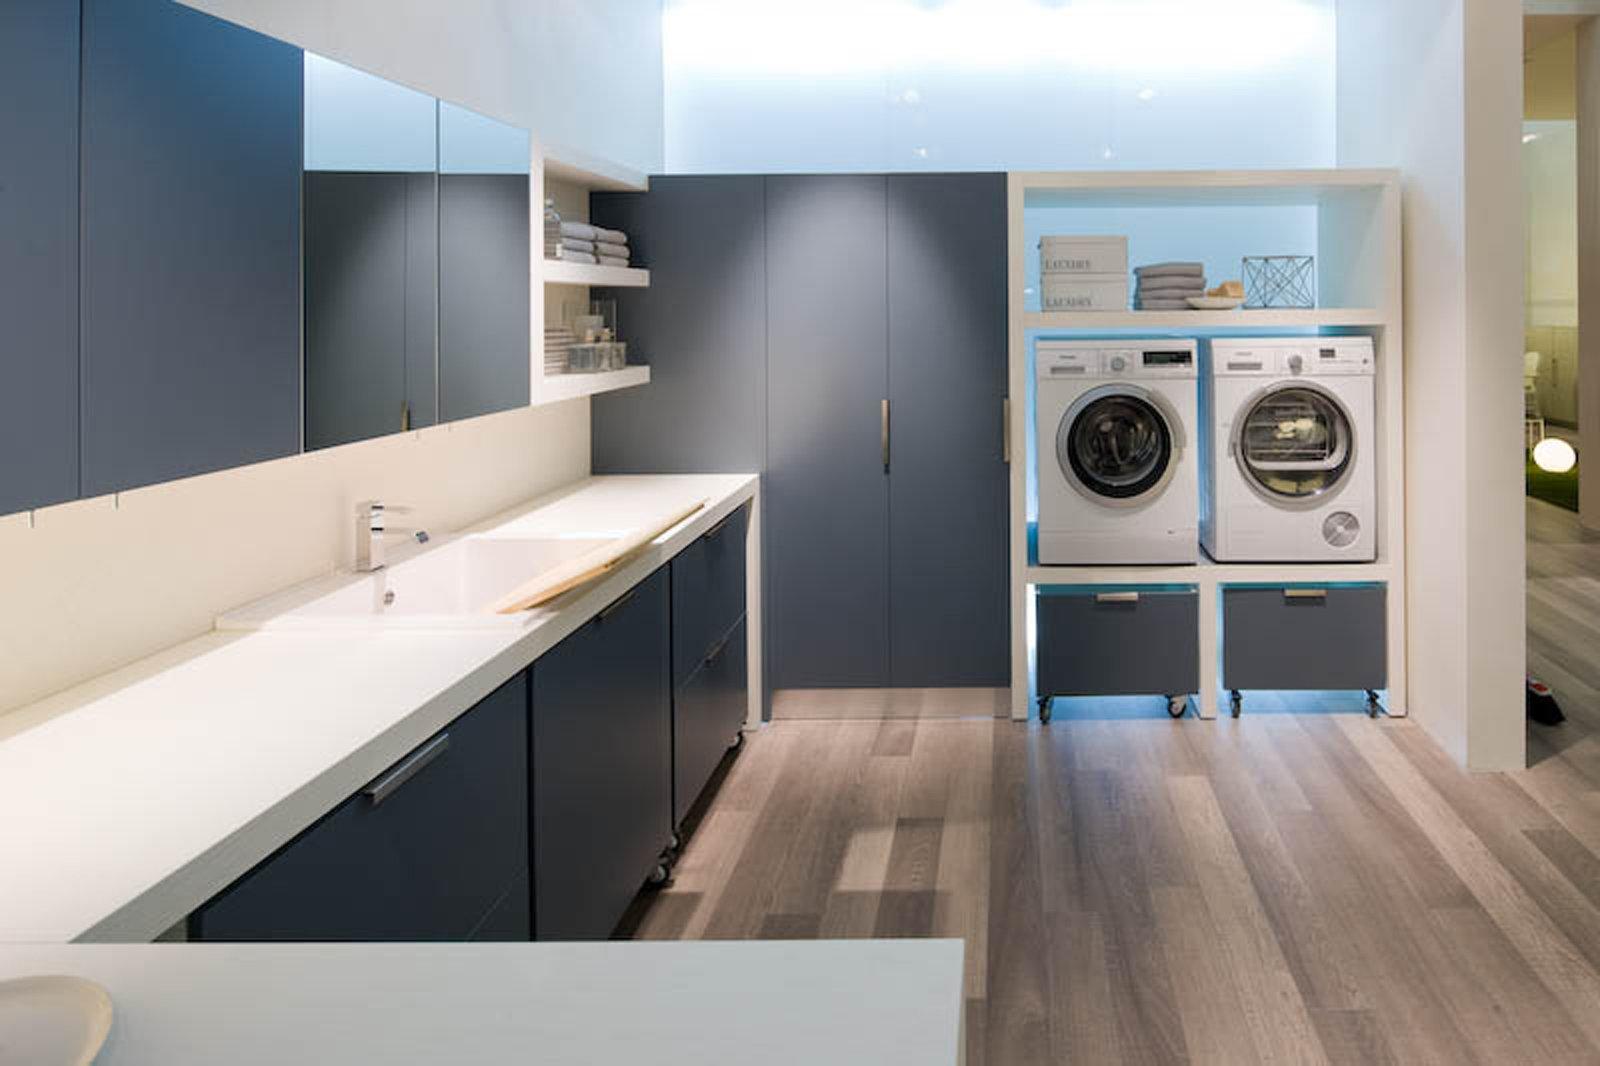 6ideagroup-spazioevoluzione-lavanderiaestireria